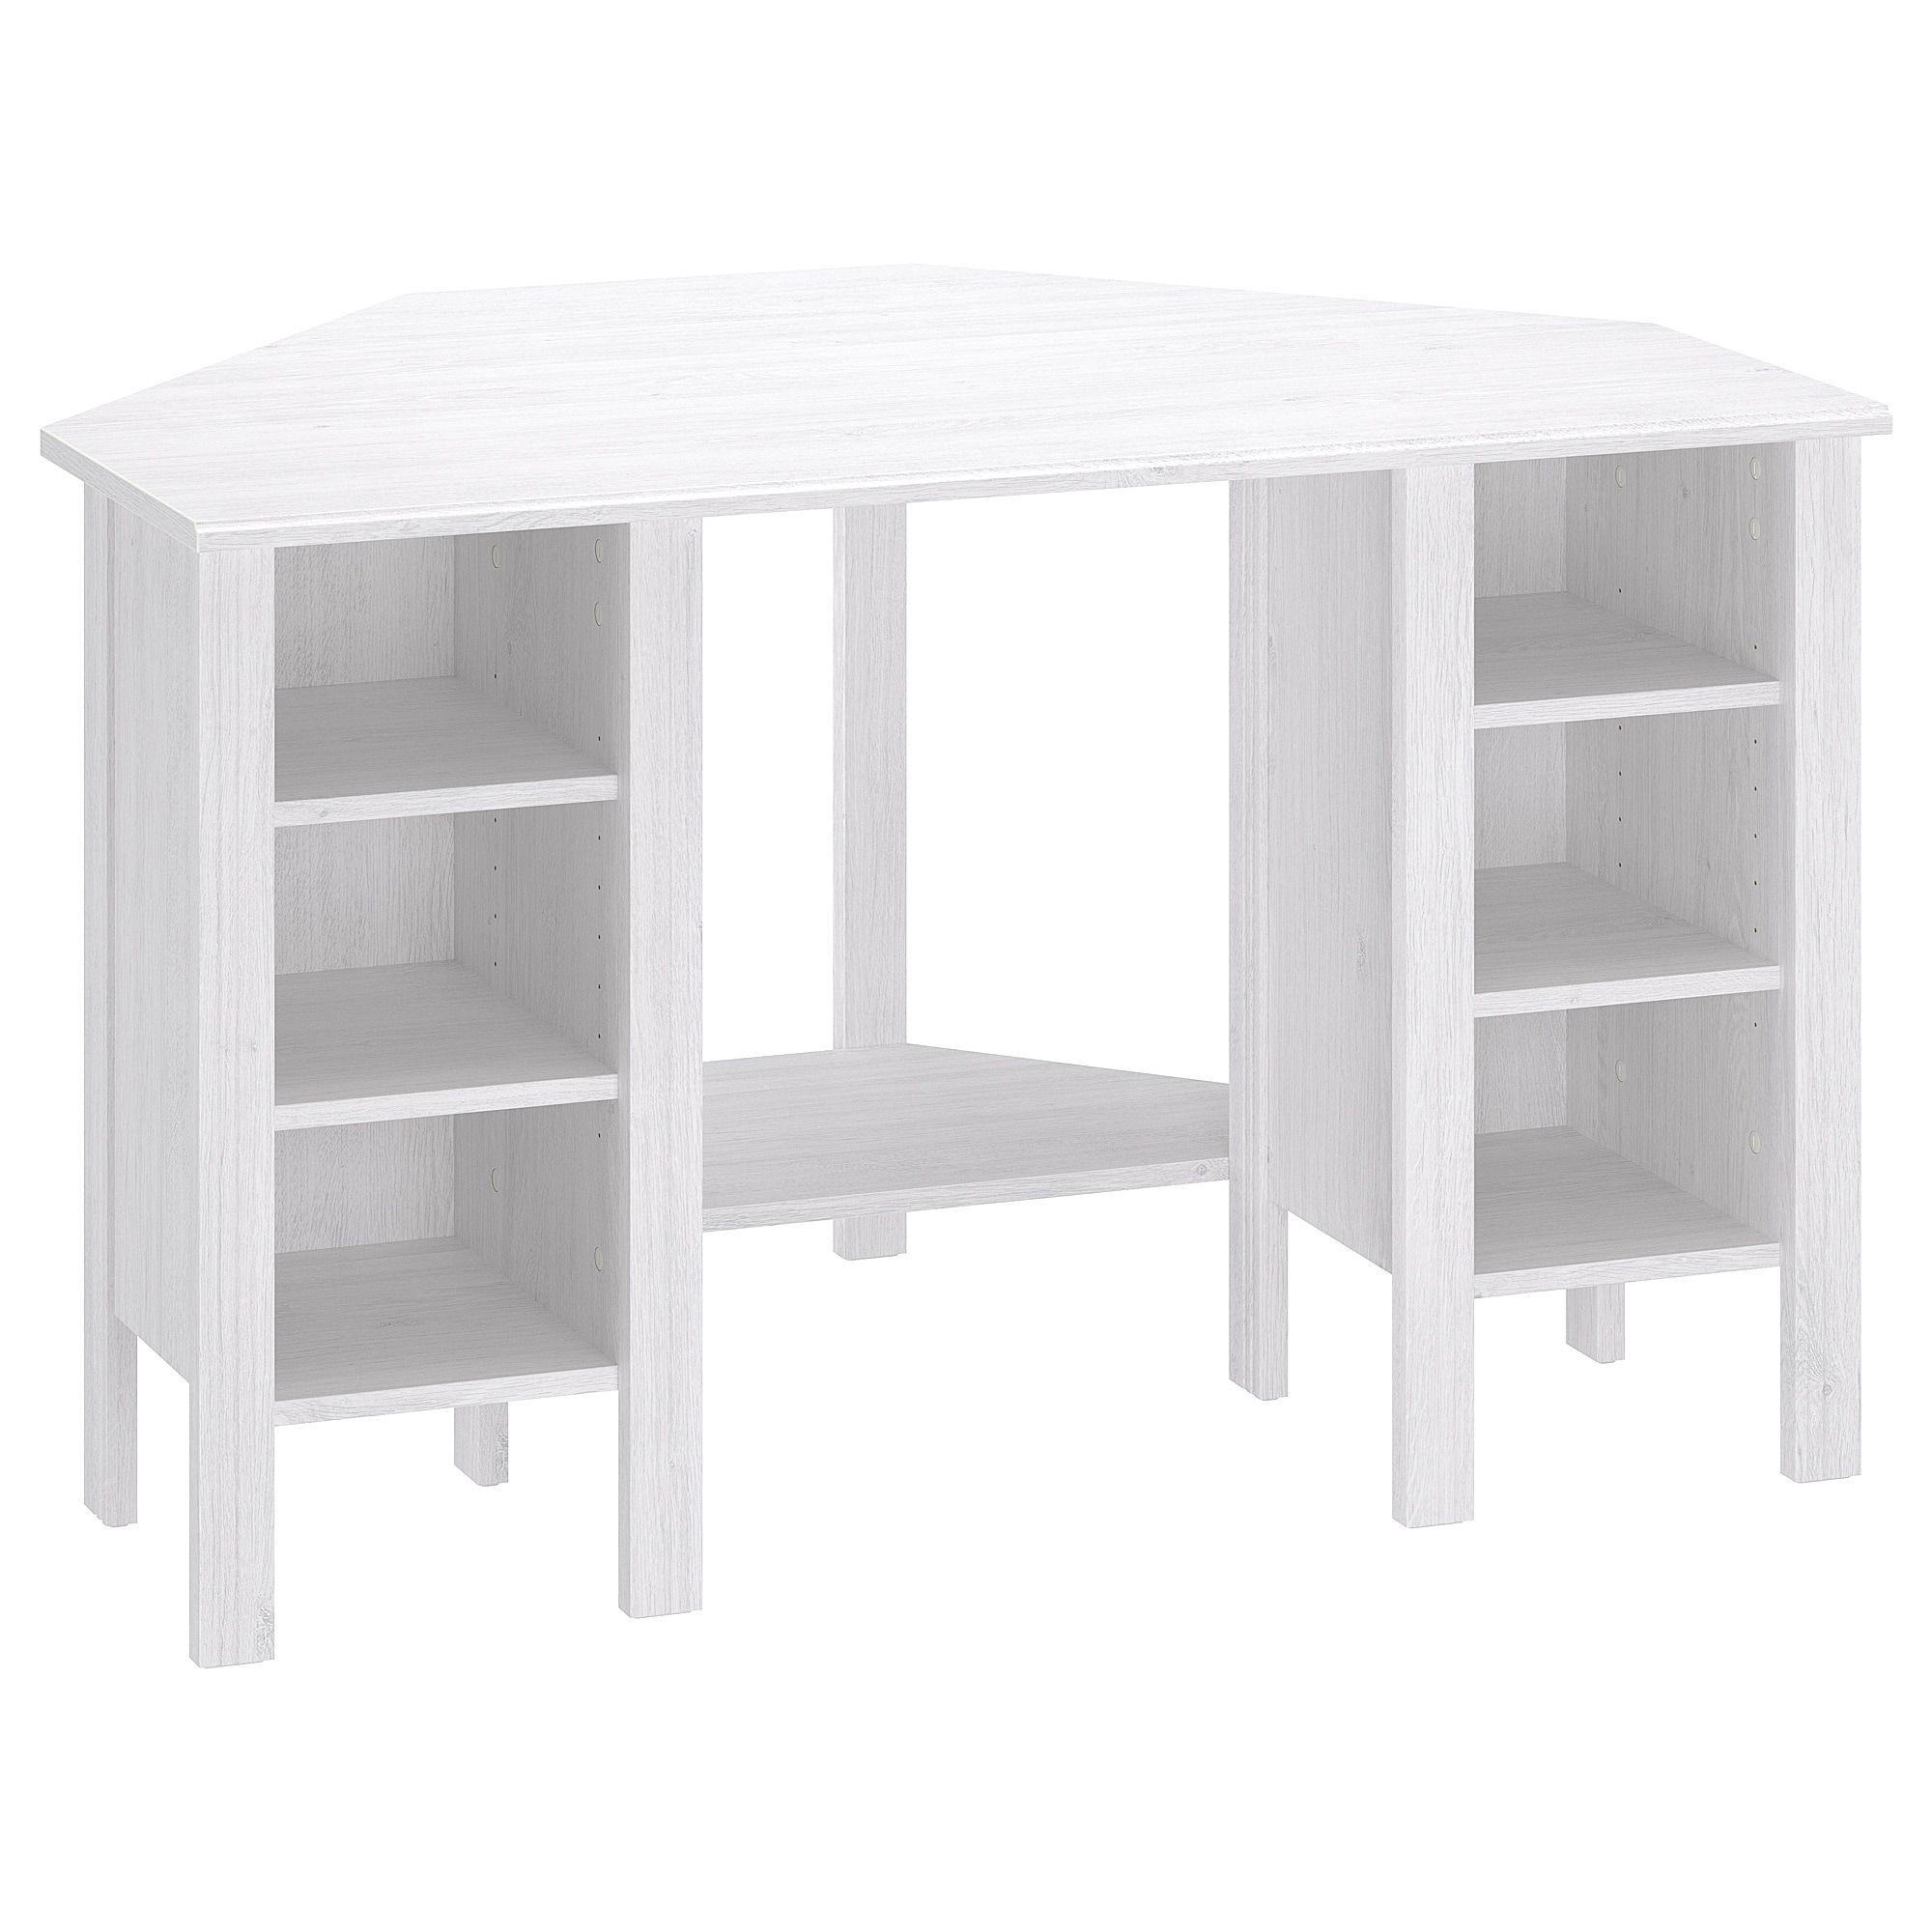 Brusali Corner Desk White 120x73 Cm White Desks Ikea Desk